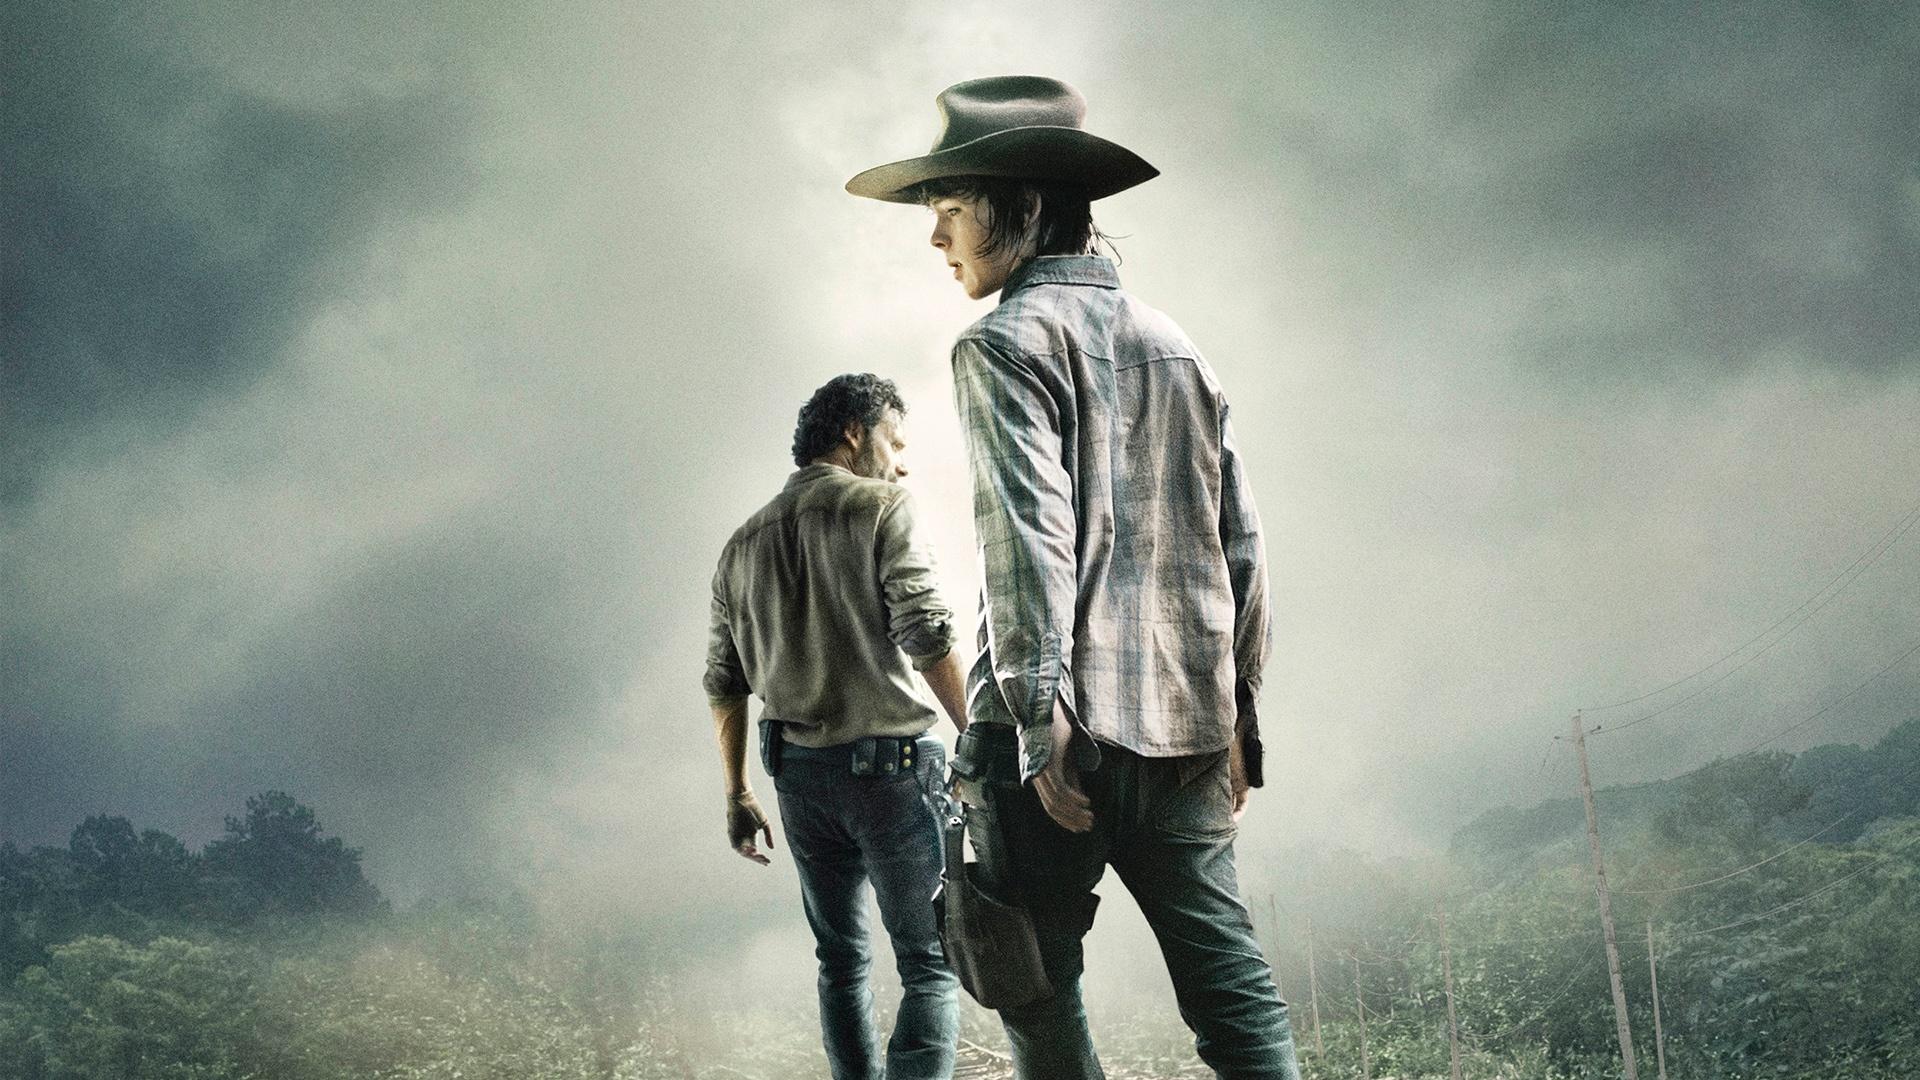 The Walking Dead 2014 Wallpapers HD Wallpapers 1920x1080